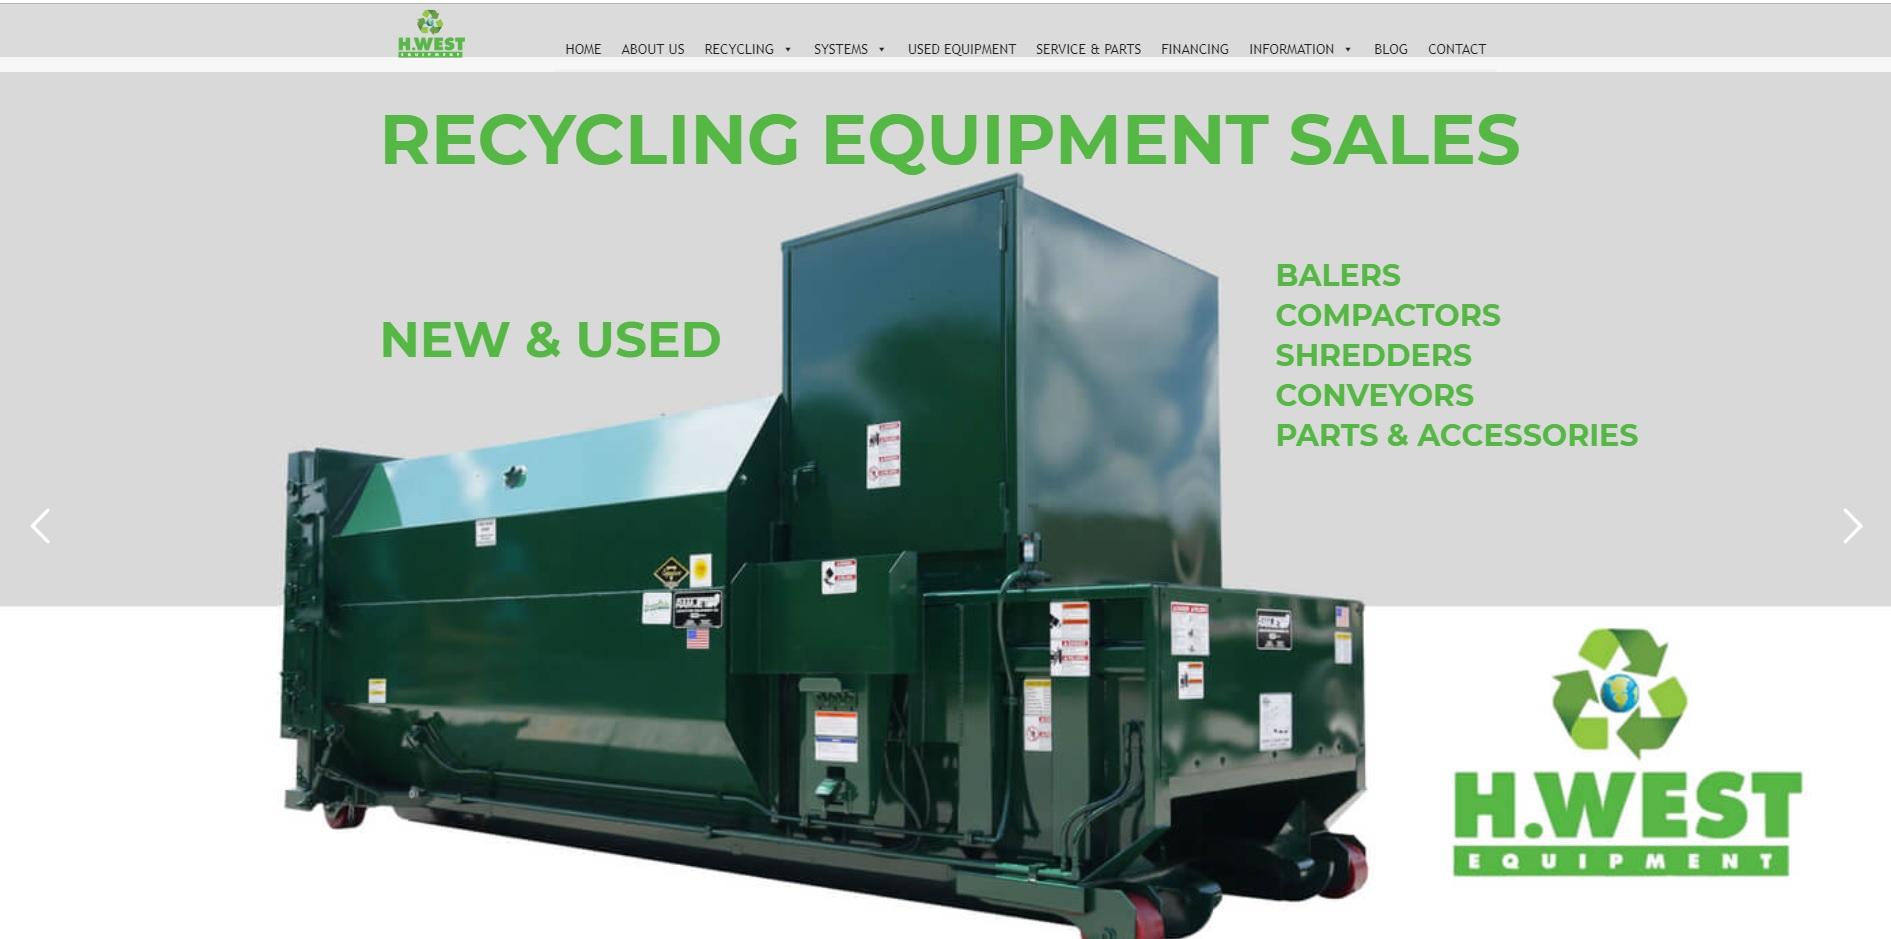 H. West Equipment, Inc.